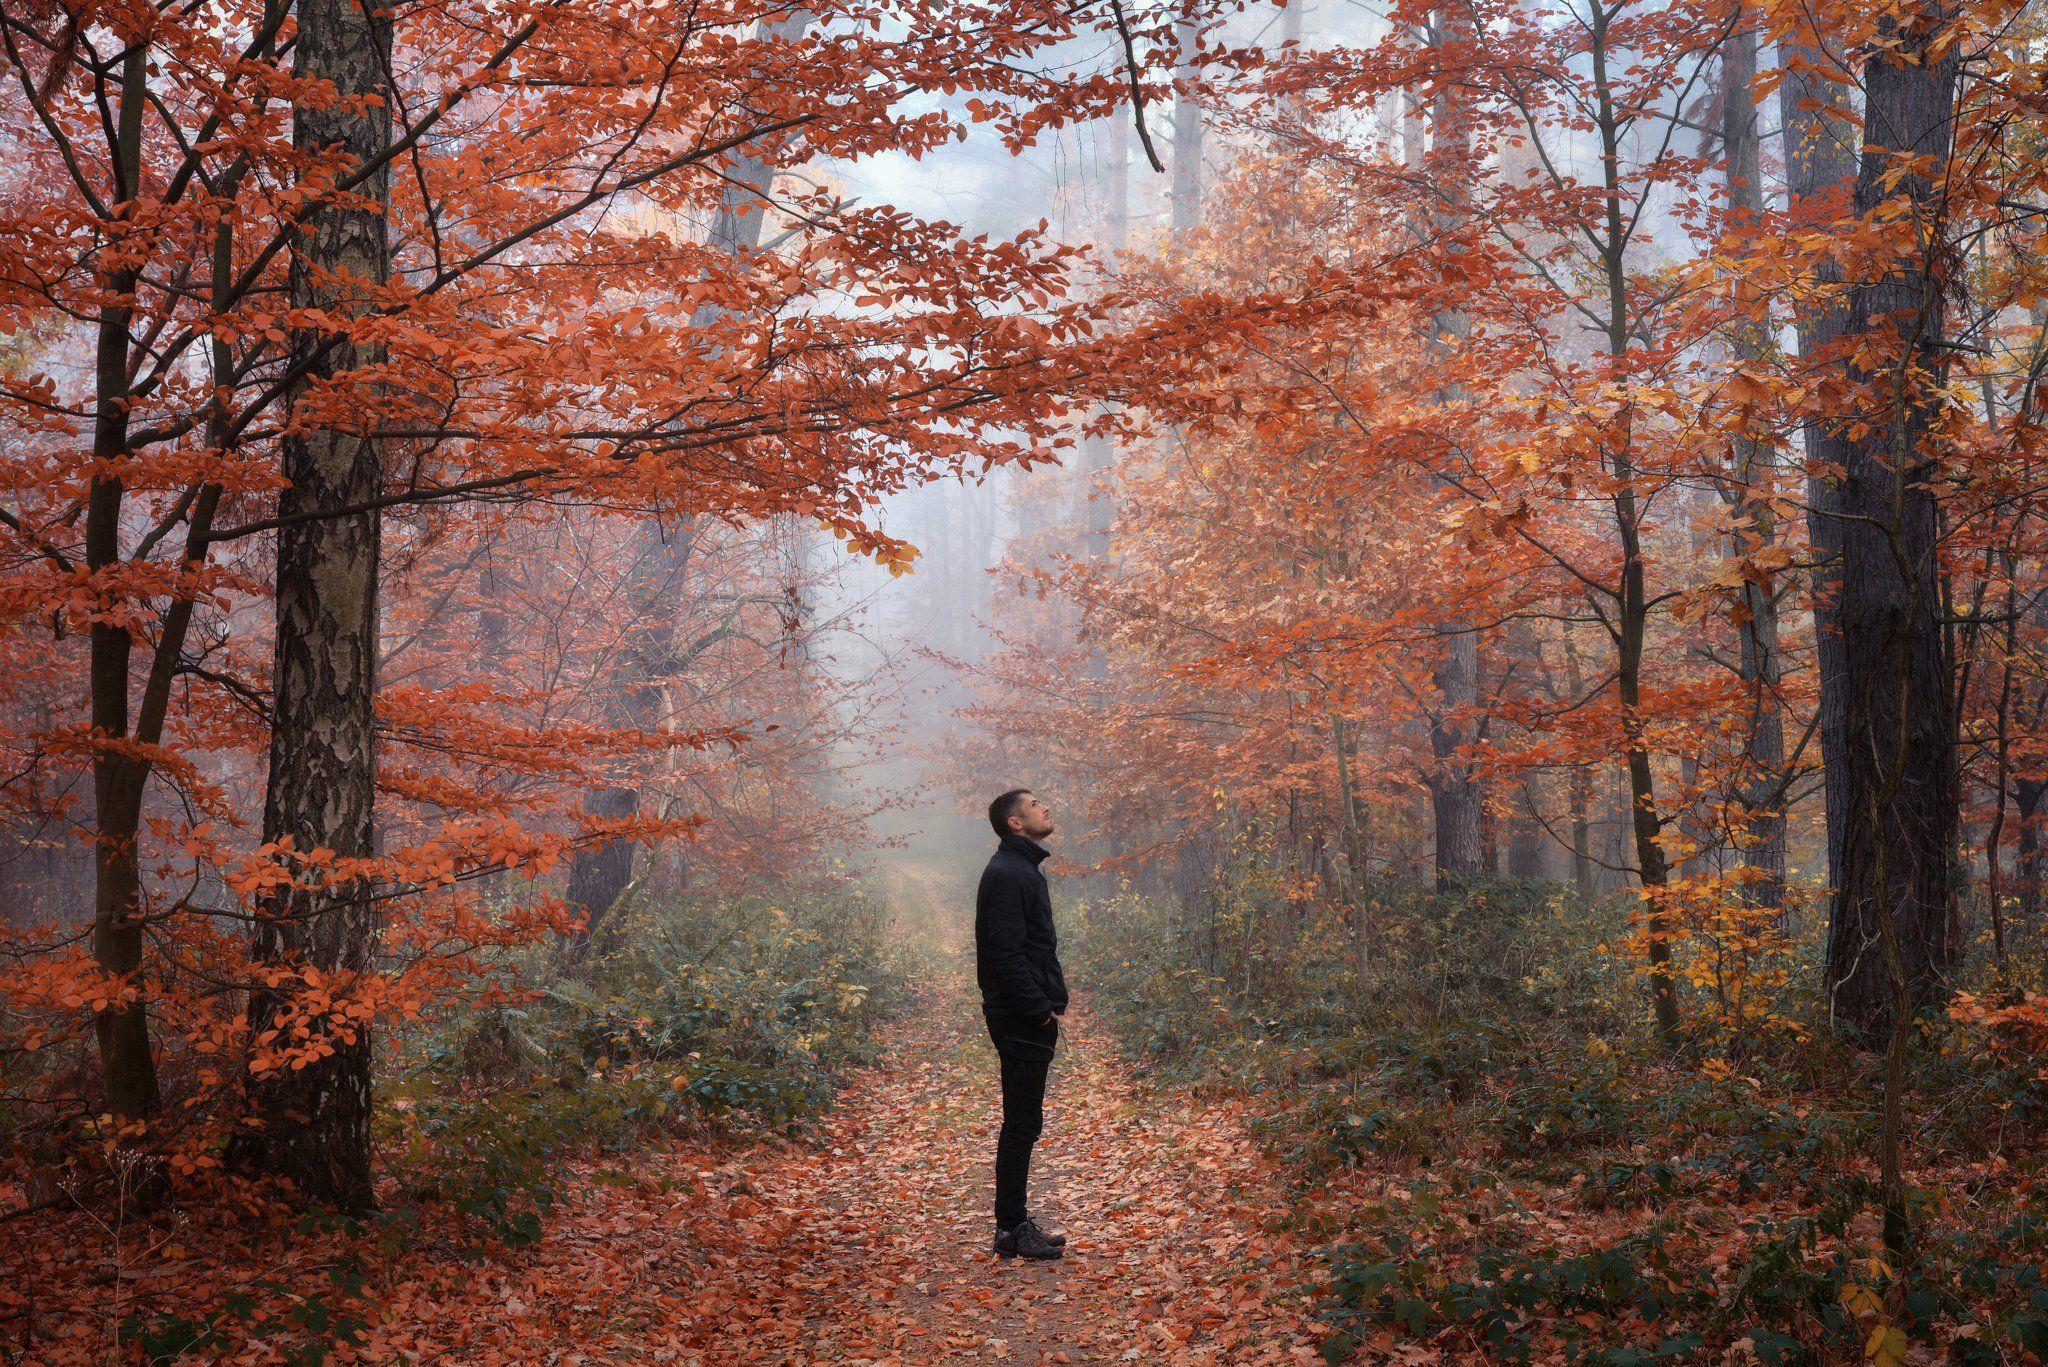 alone in the woods один в лесу forest foggy mist path road dranikowski trees autumn fall fog nikon, Radoslaw Dranikowski